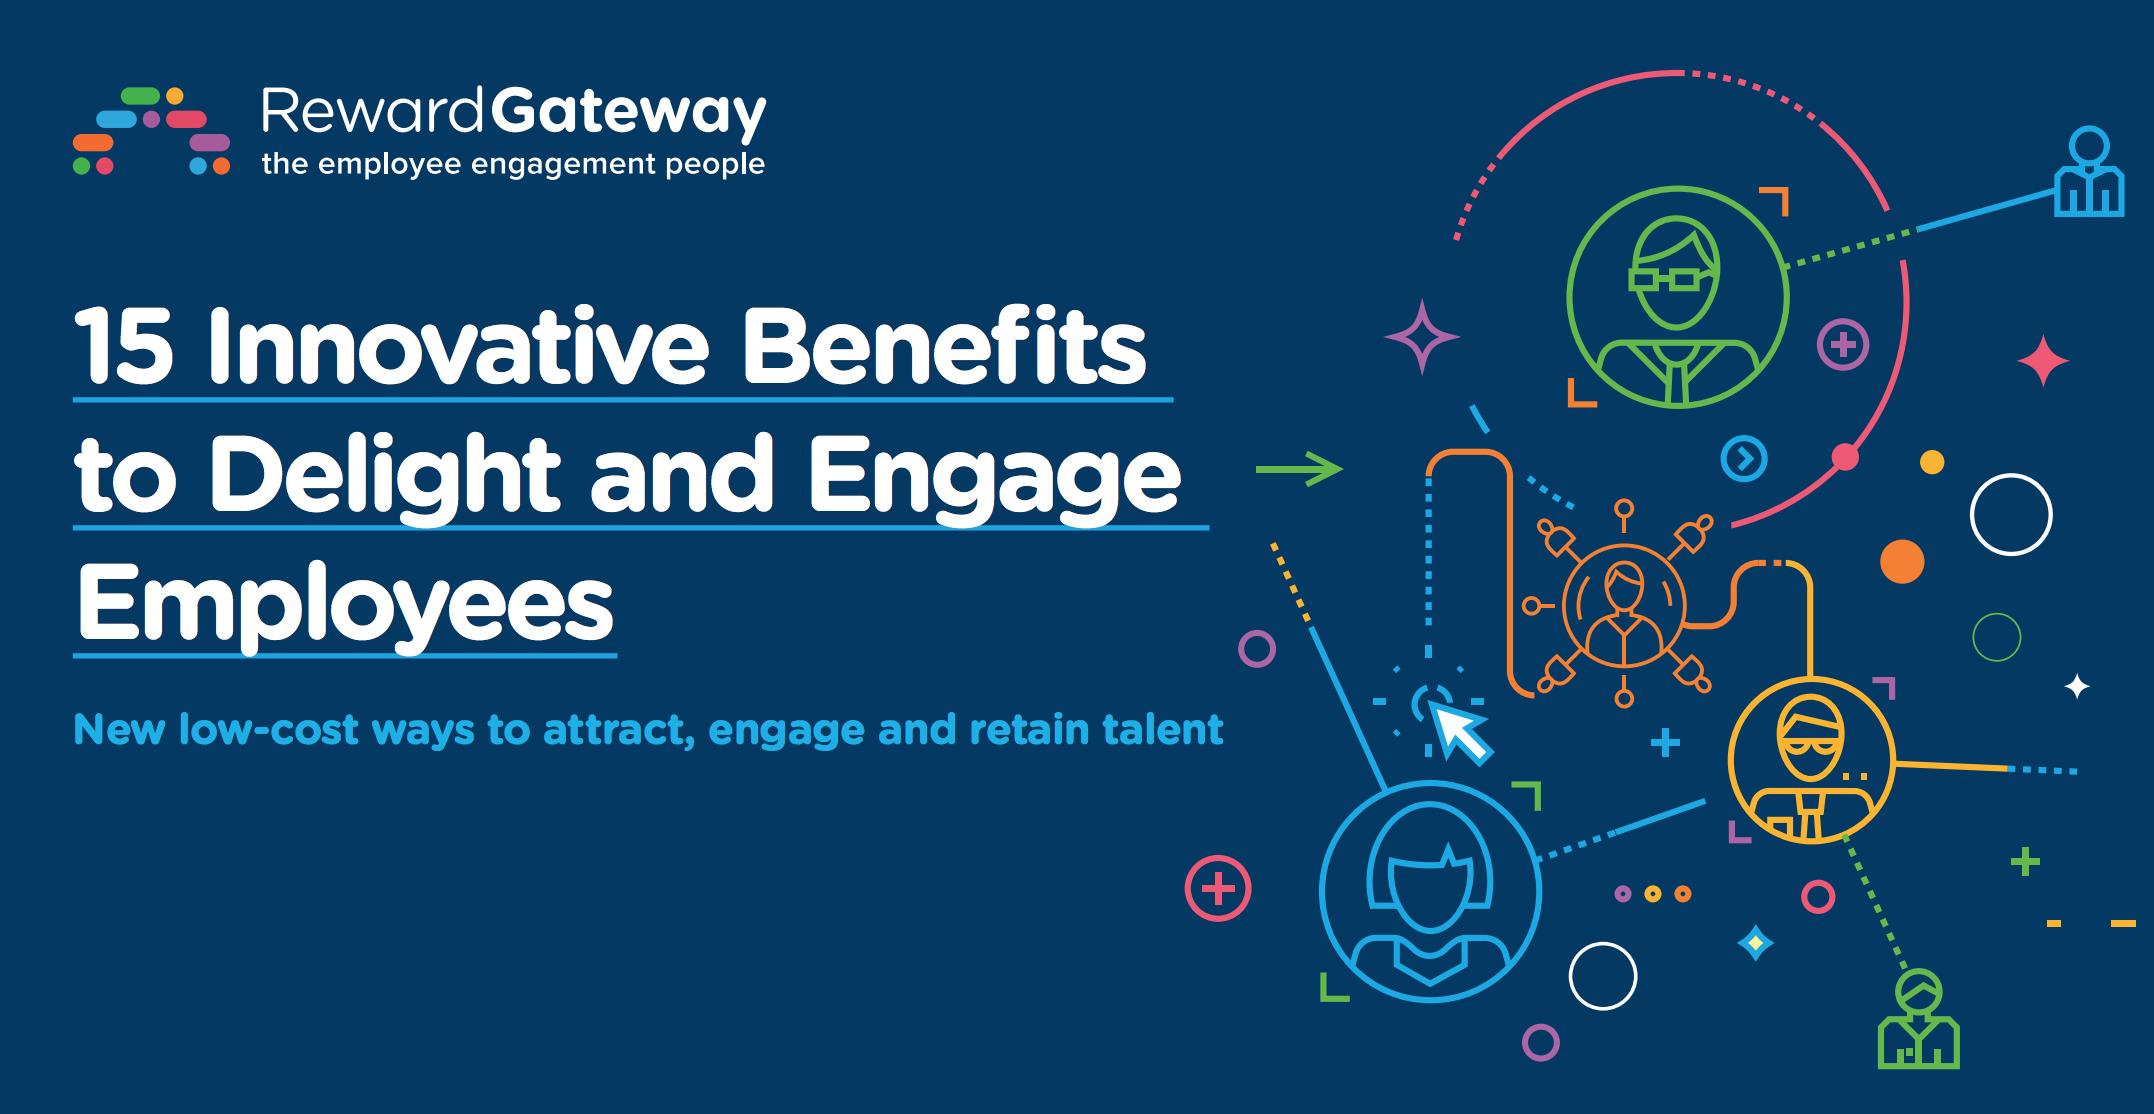 Innovative employee benefit ideas